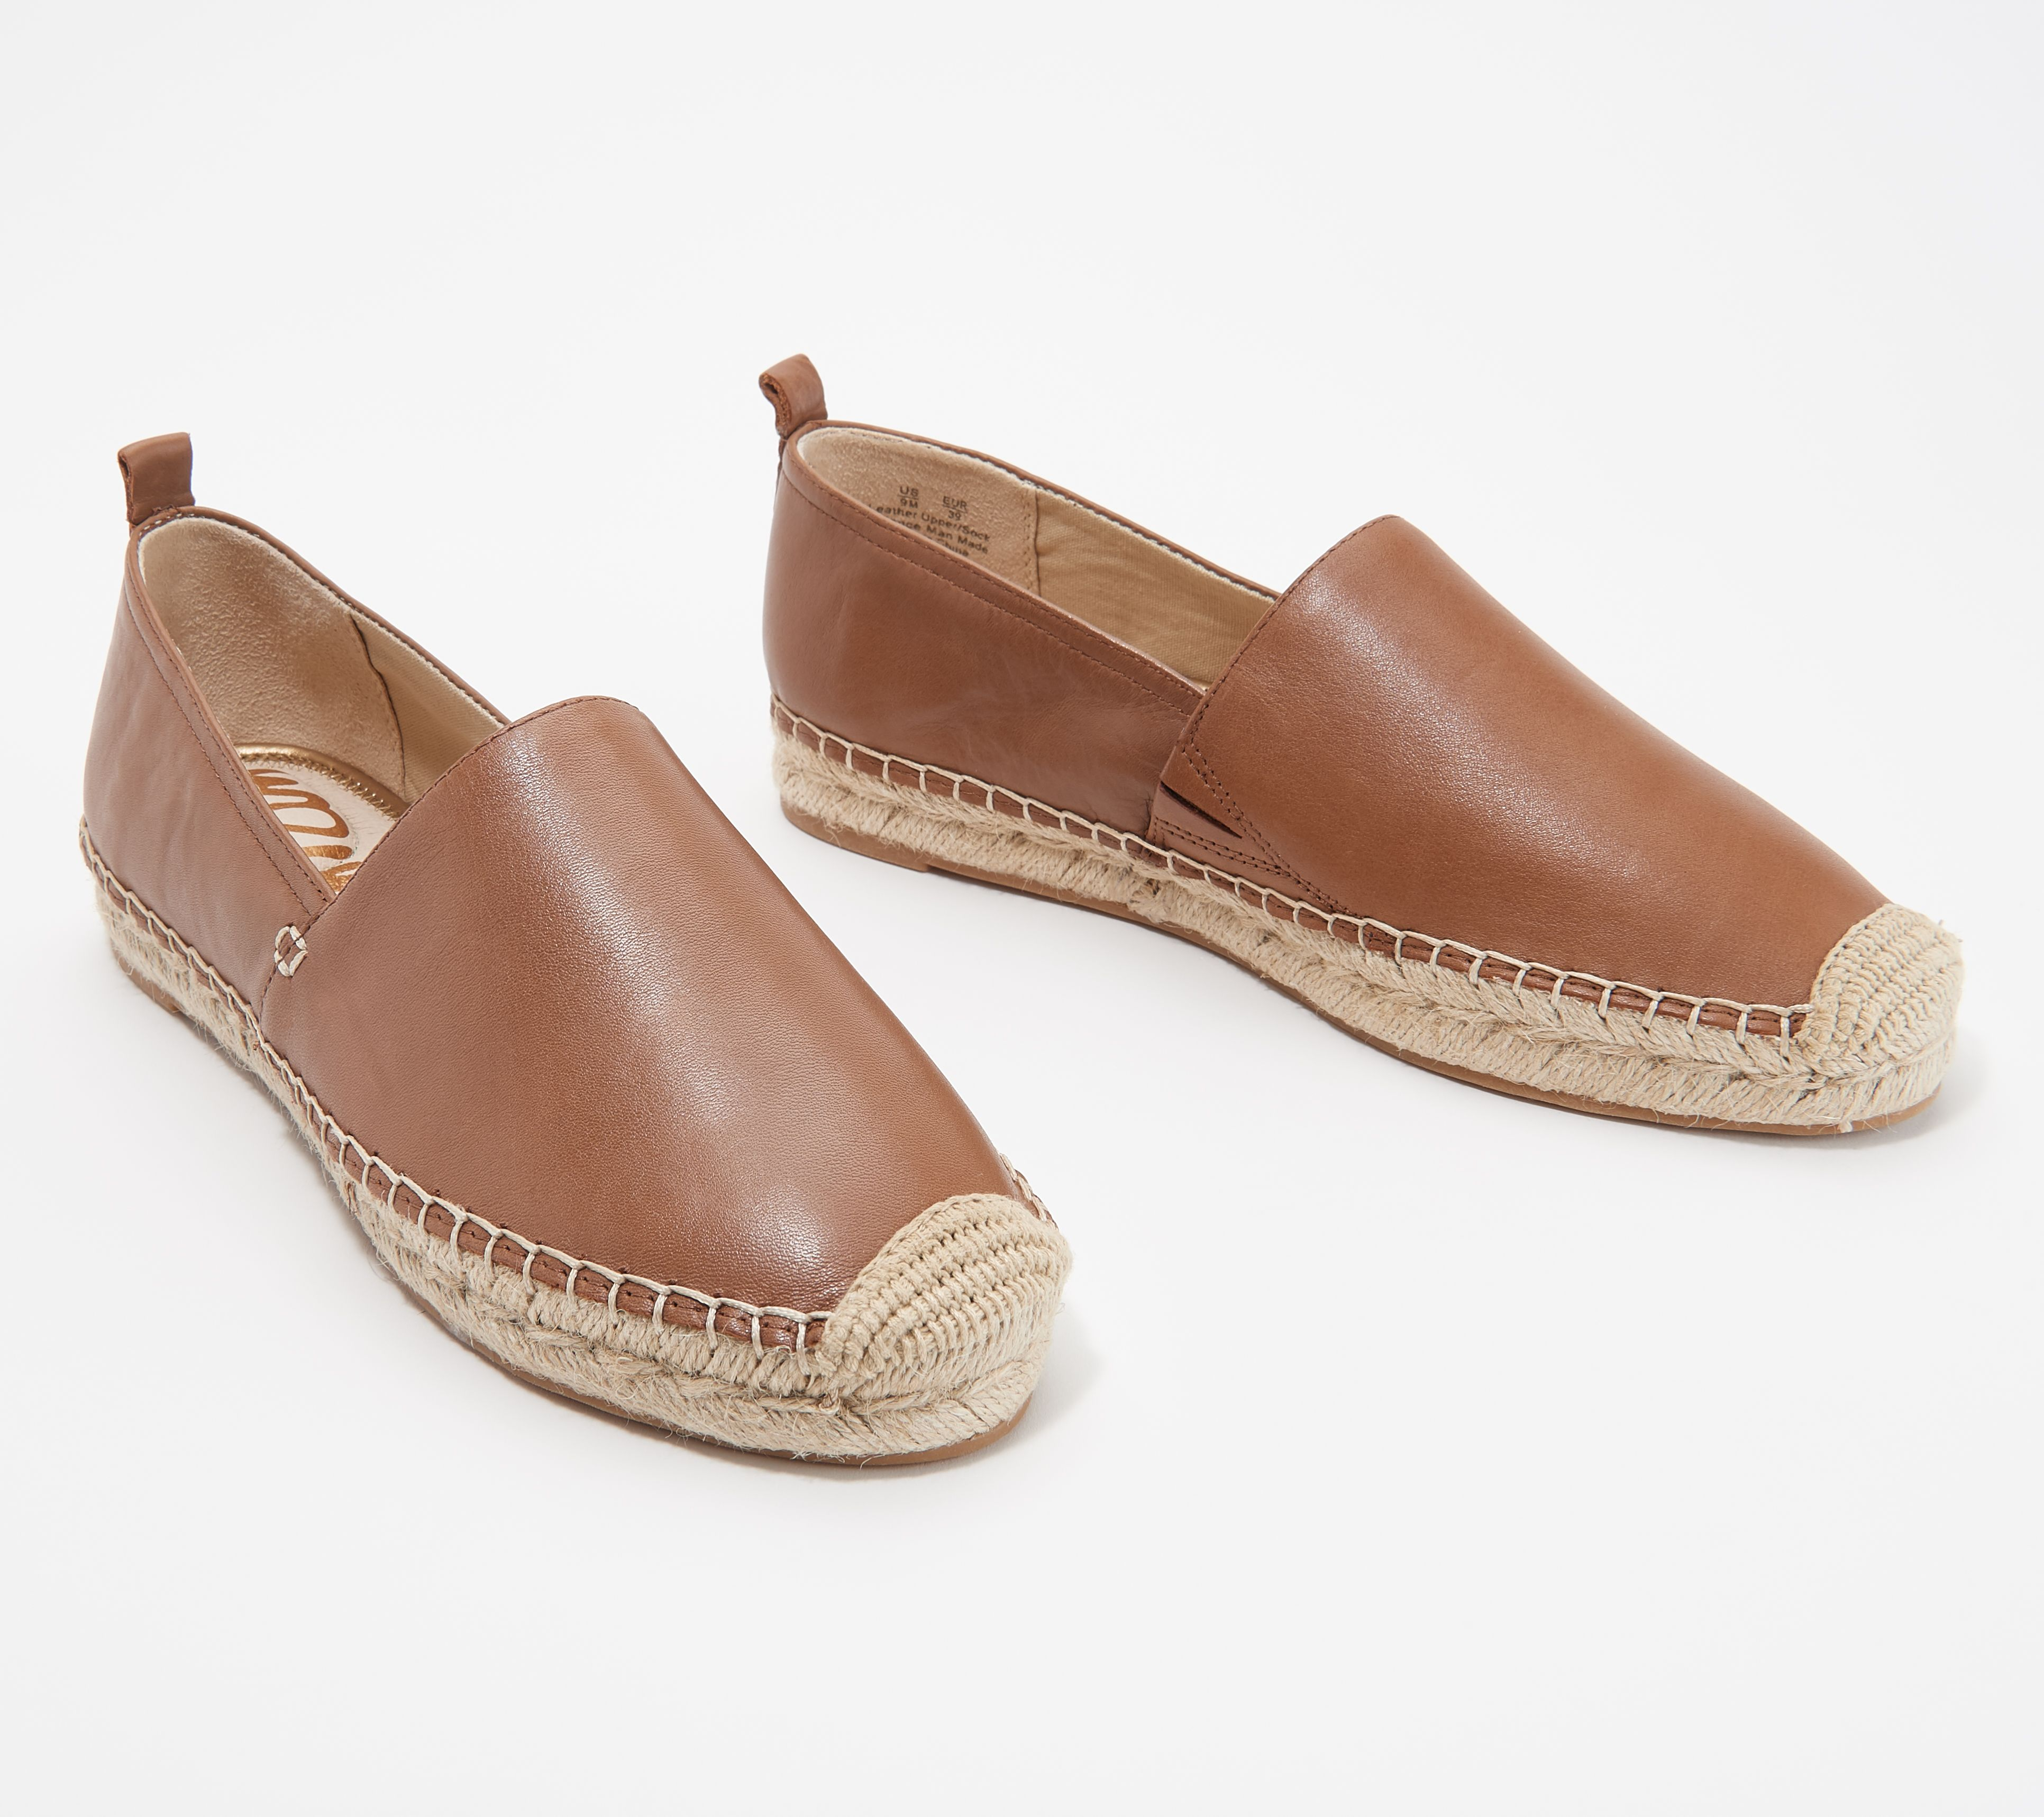 16dadb40f4 Sam Edelman Leather Slip-On Espadrilles - Khloe - Page 1 — QVC.com